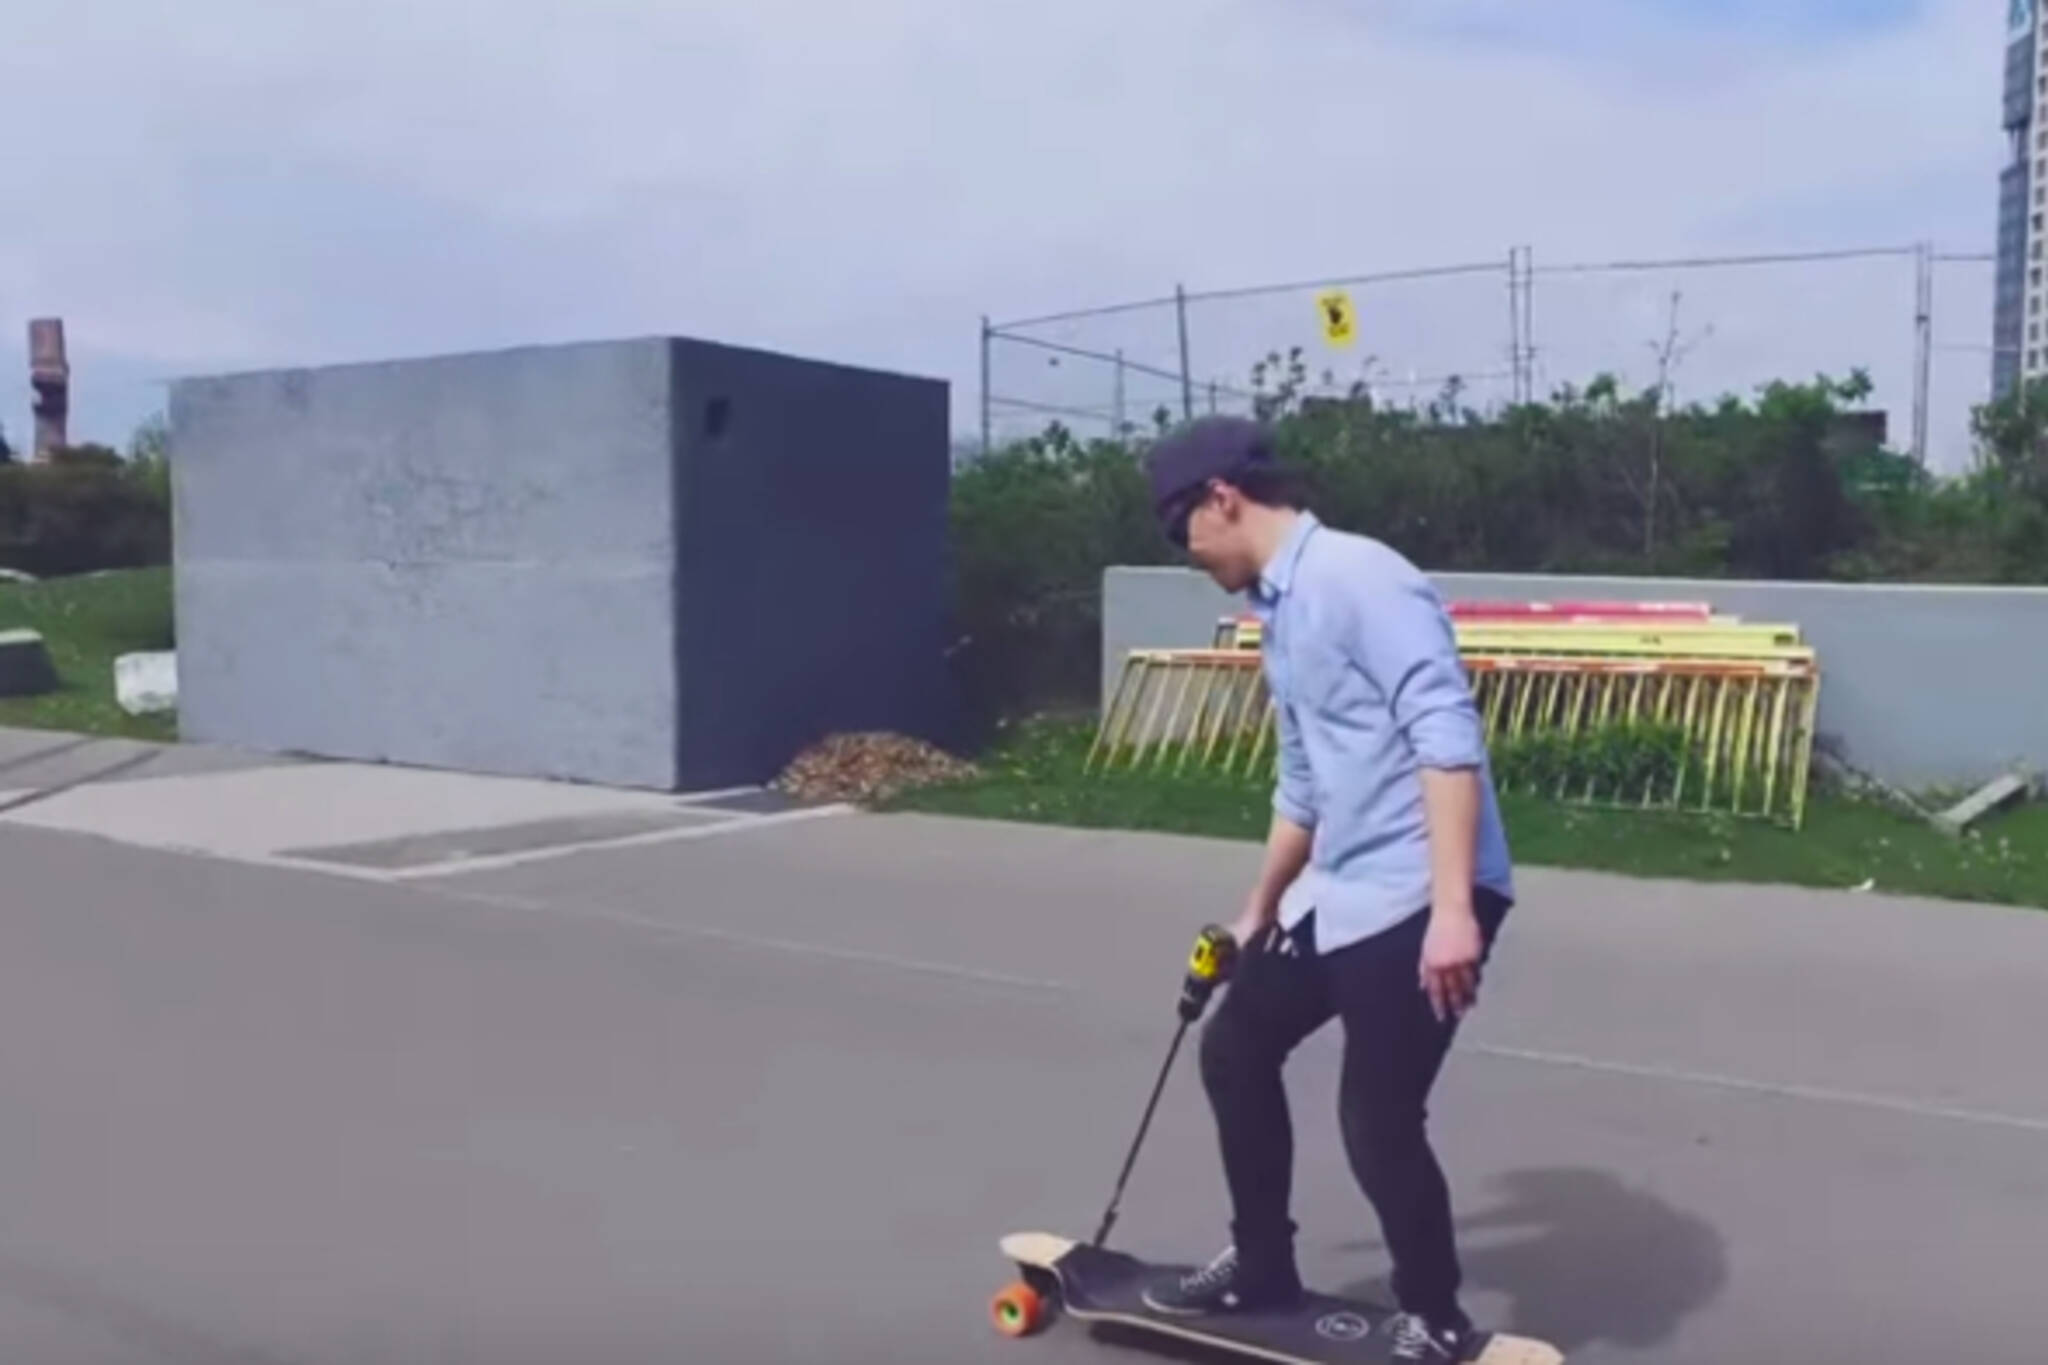 Drill skateboard Toronto